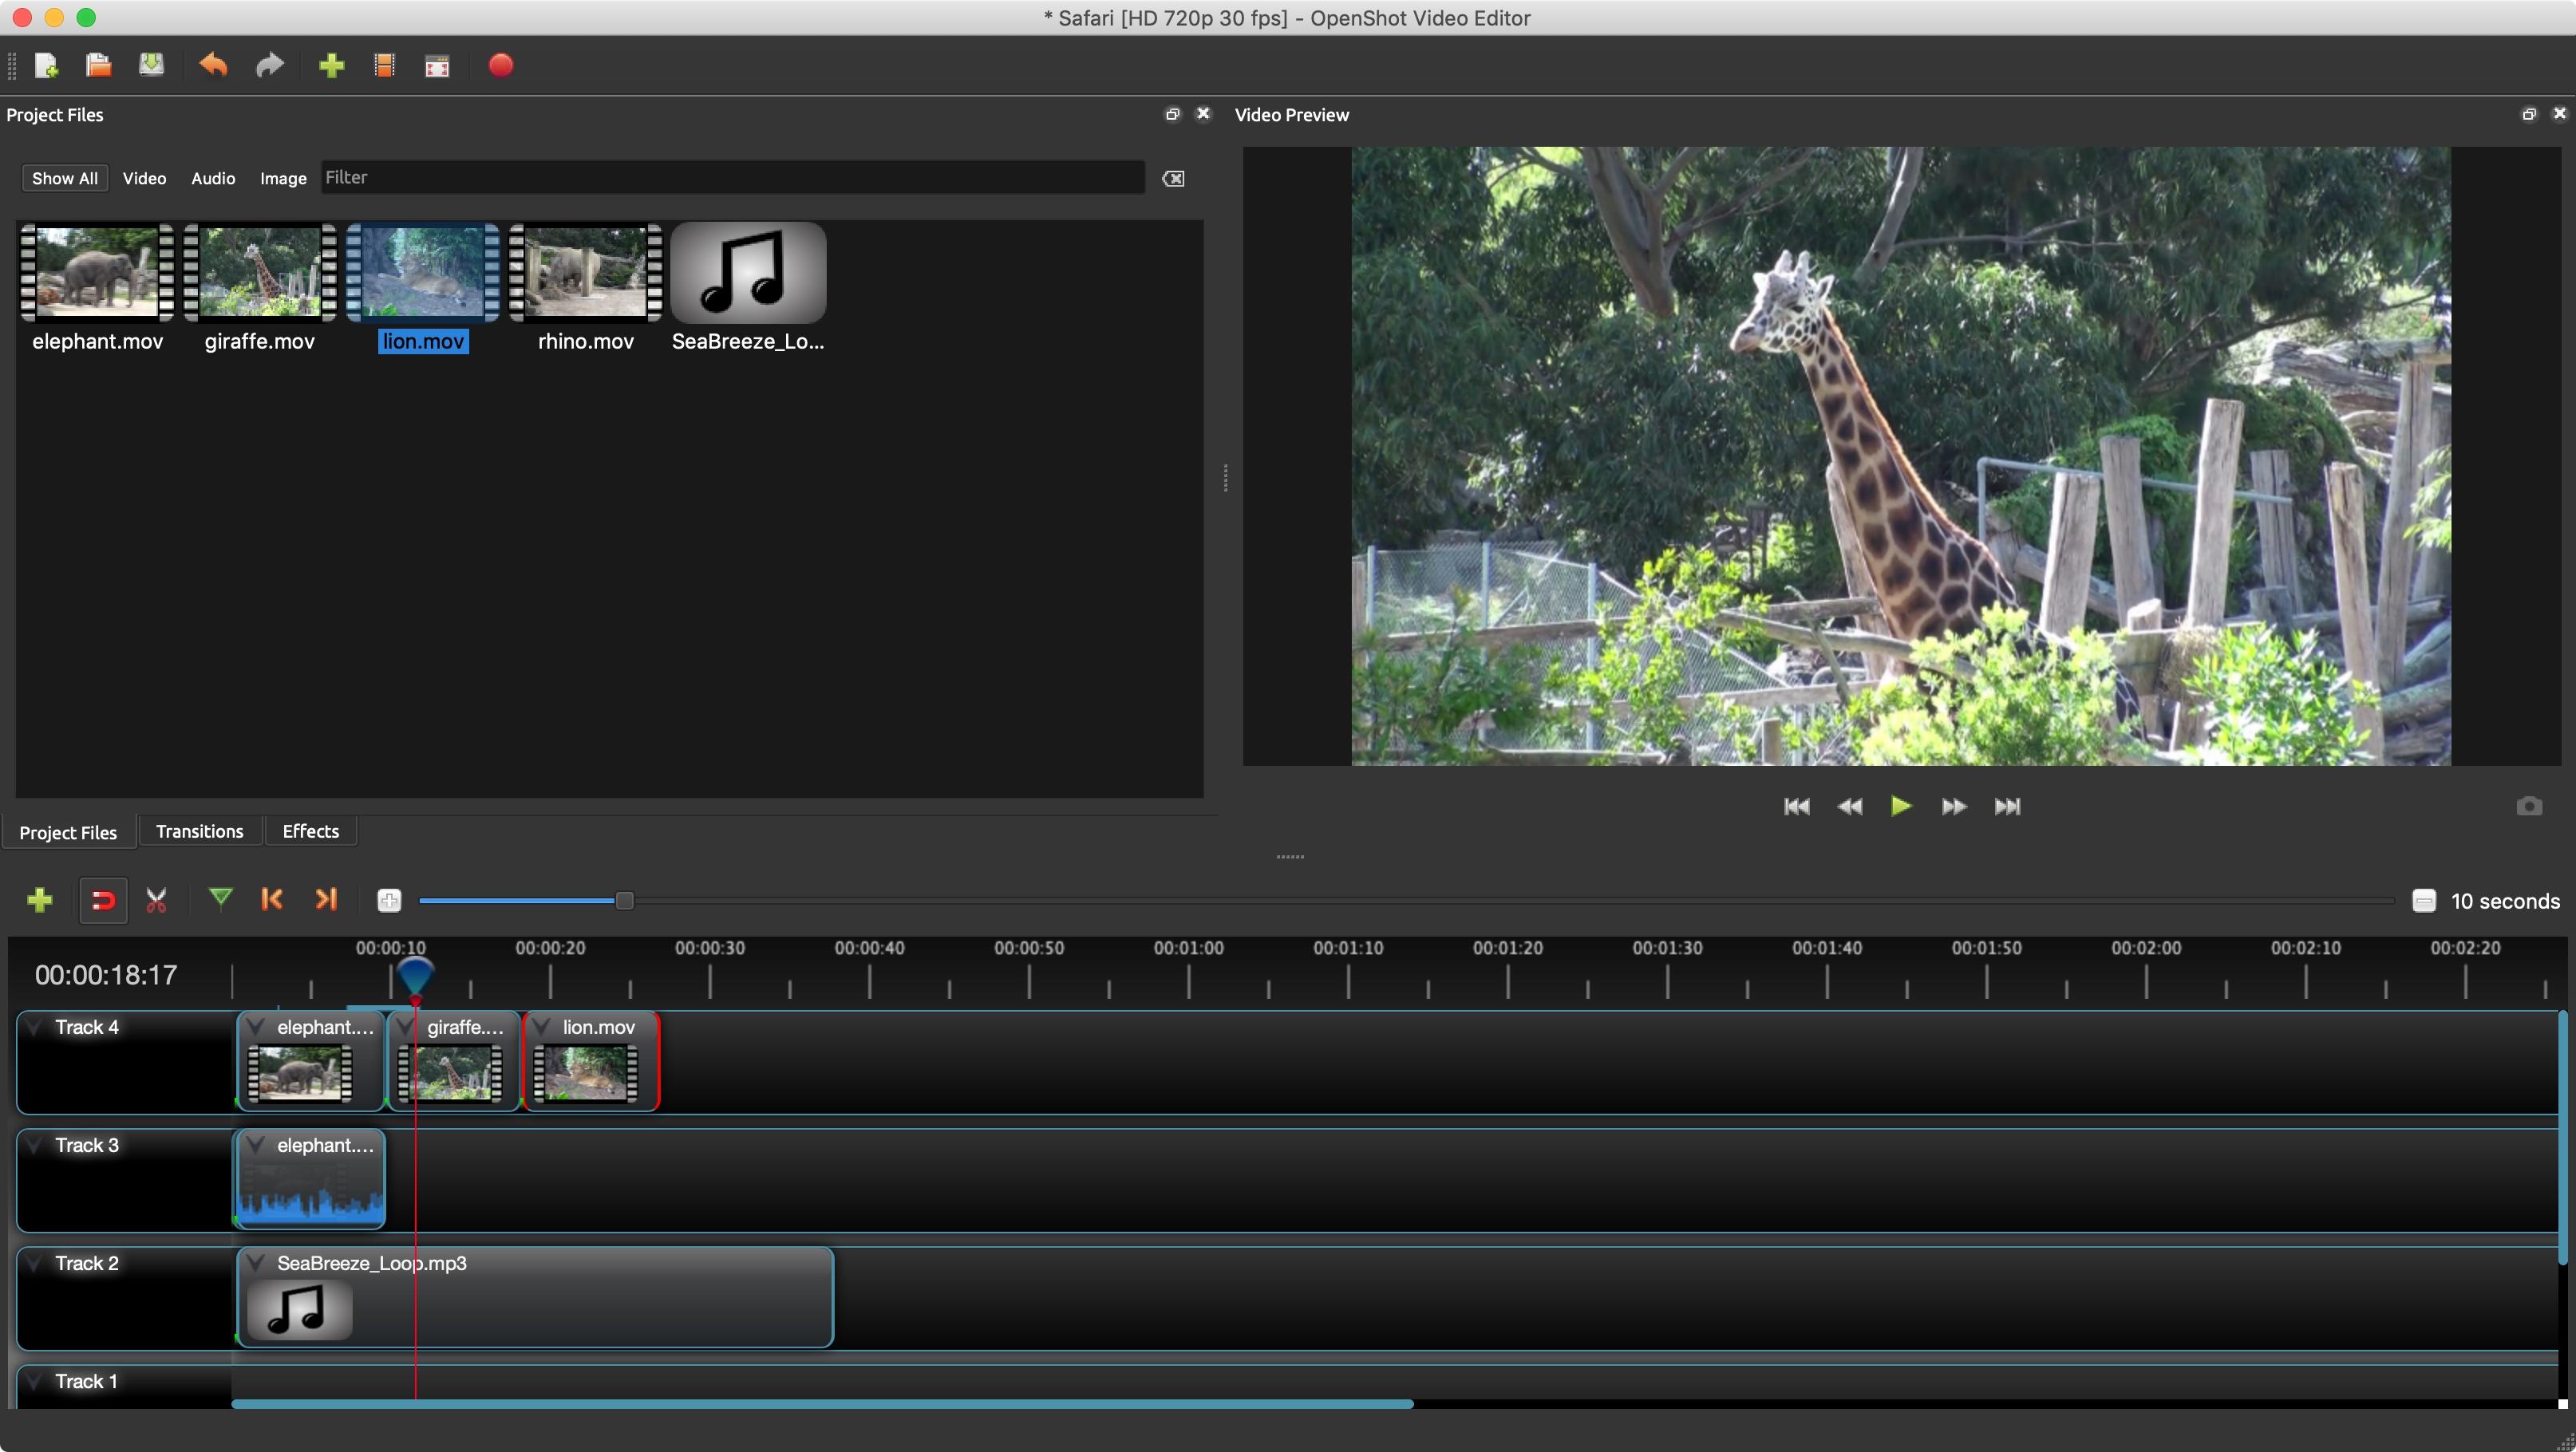 openshot free online video tools